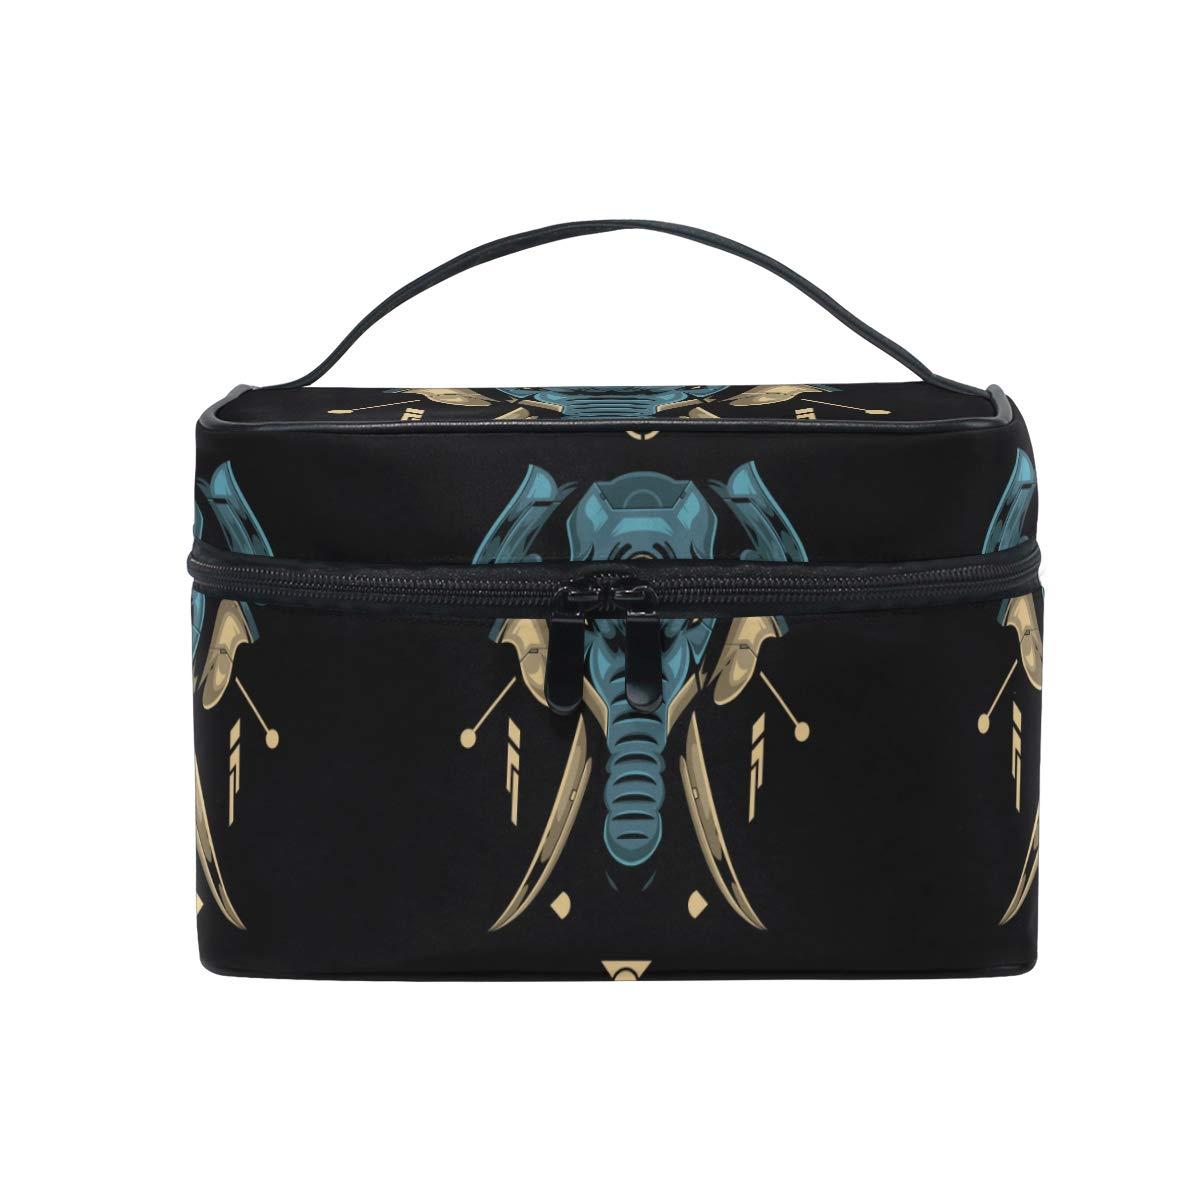 Cute Elephant Head Black Women Makeup Bag Travel Cosmetic Bags Toiletry Train Case Beauty Pouch Organizer